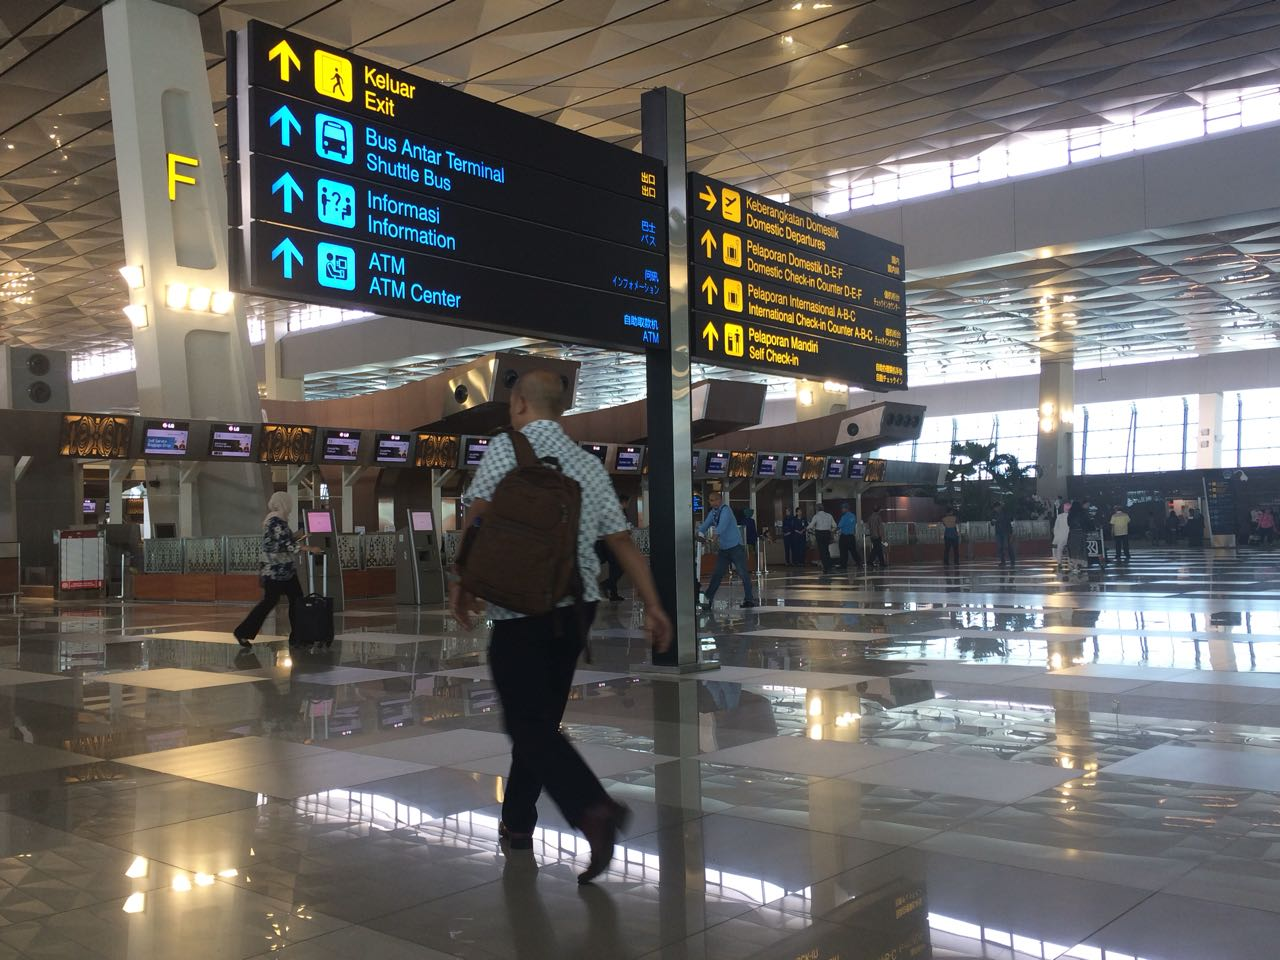 https: img.okezone.com content 2020 10 31 320 2302143 stimulus-airport-tax-bikin-harga-tiket-murah-hingga-akhir-tahun-cek-4-faktanya-NfxCzIws5d.jpg